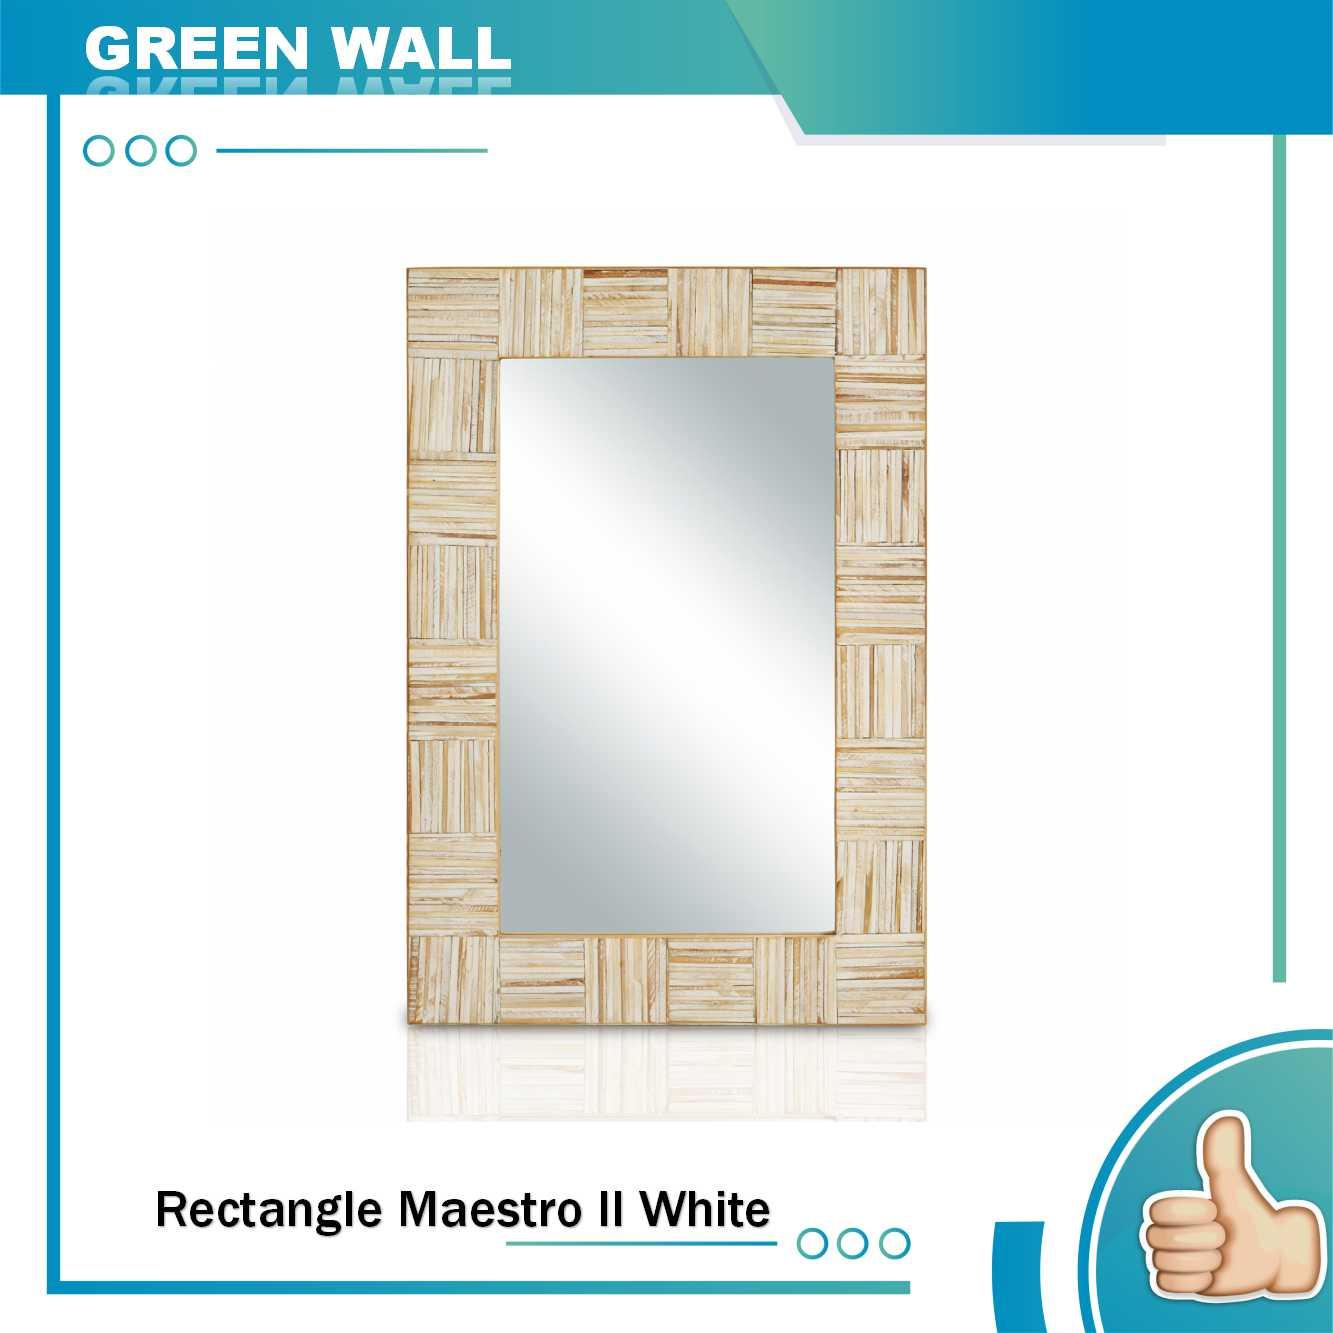 Home Living Green Wall Daftar Harga Plaza Furniture Savello Emerald La Kursi Kantor Jabodetabek Cermin Dinding Rectangle Maestro Ii Putih